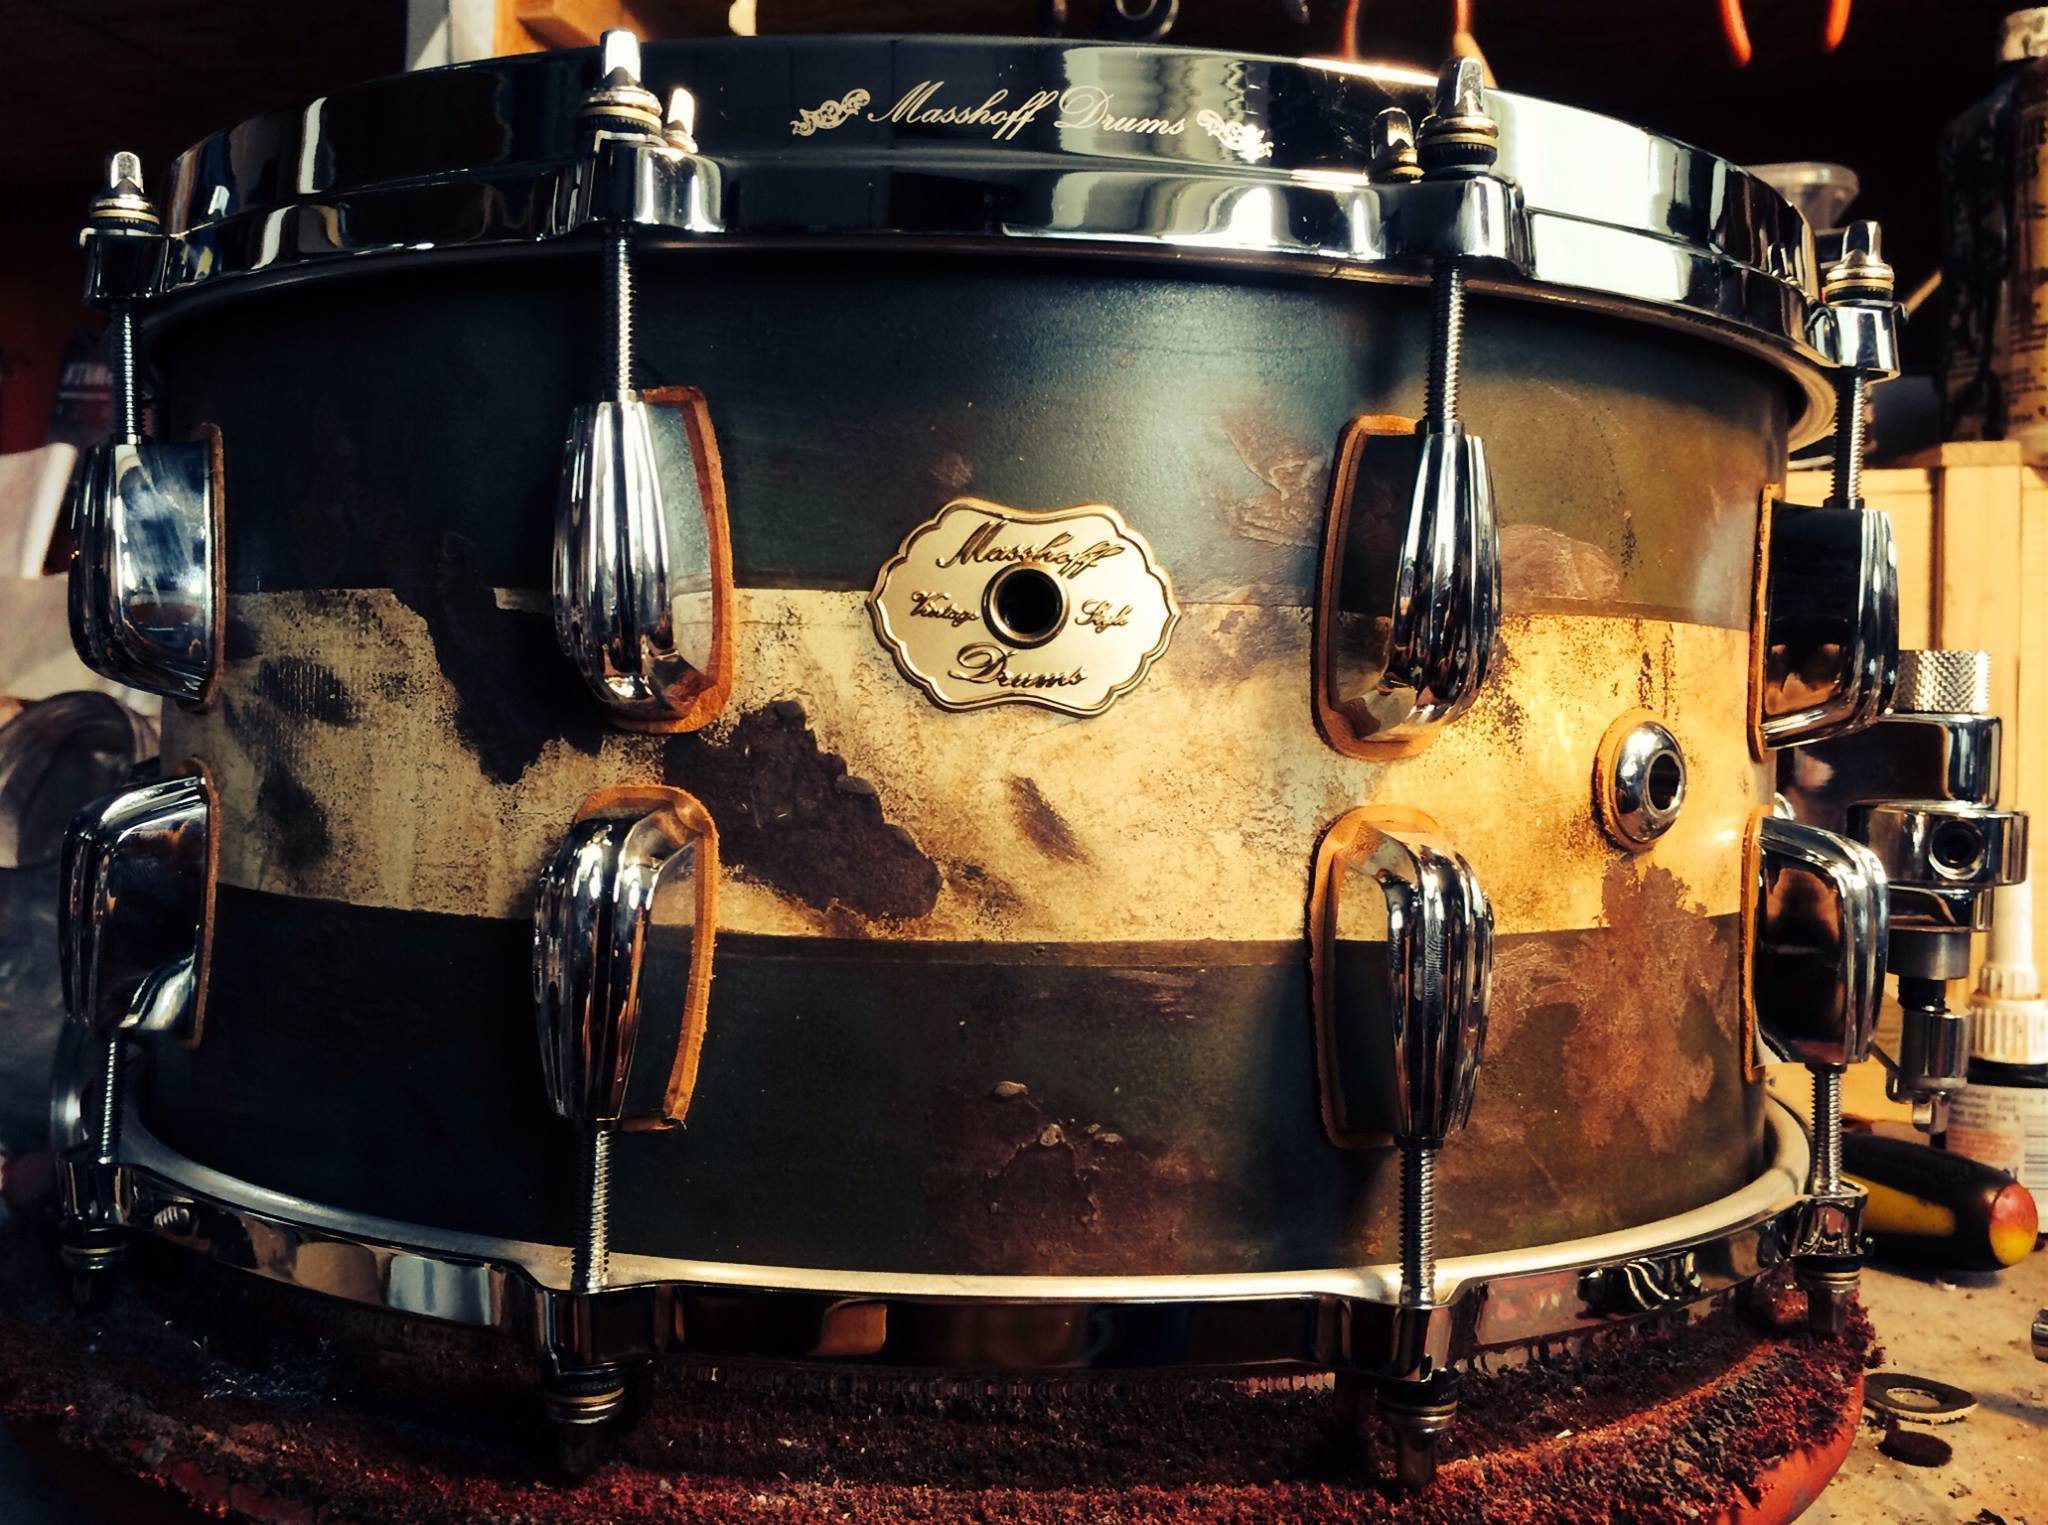 Masshof Drums Duco Snares [configurator]